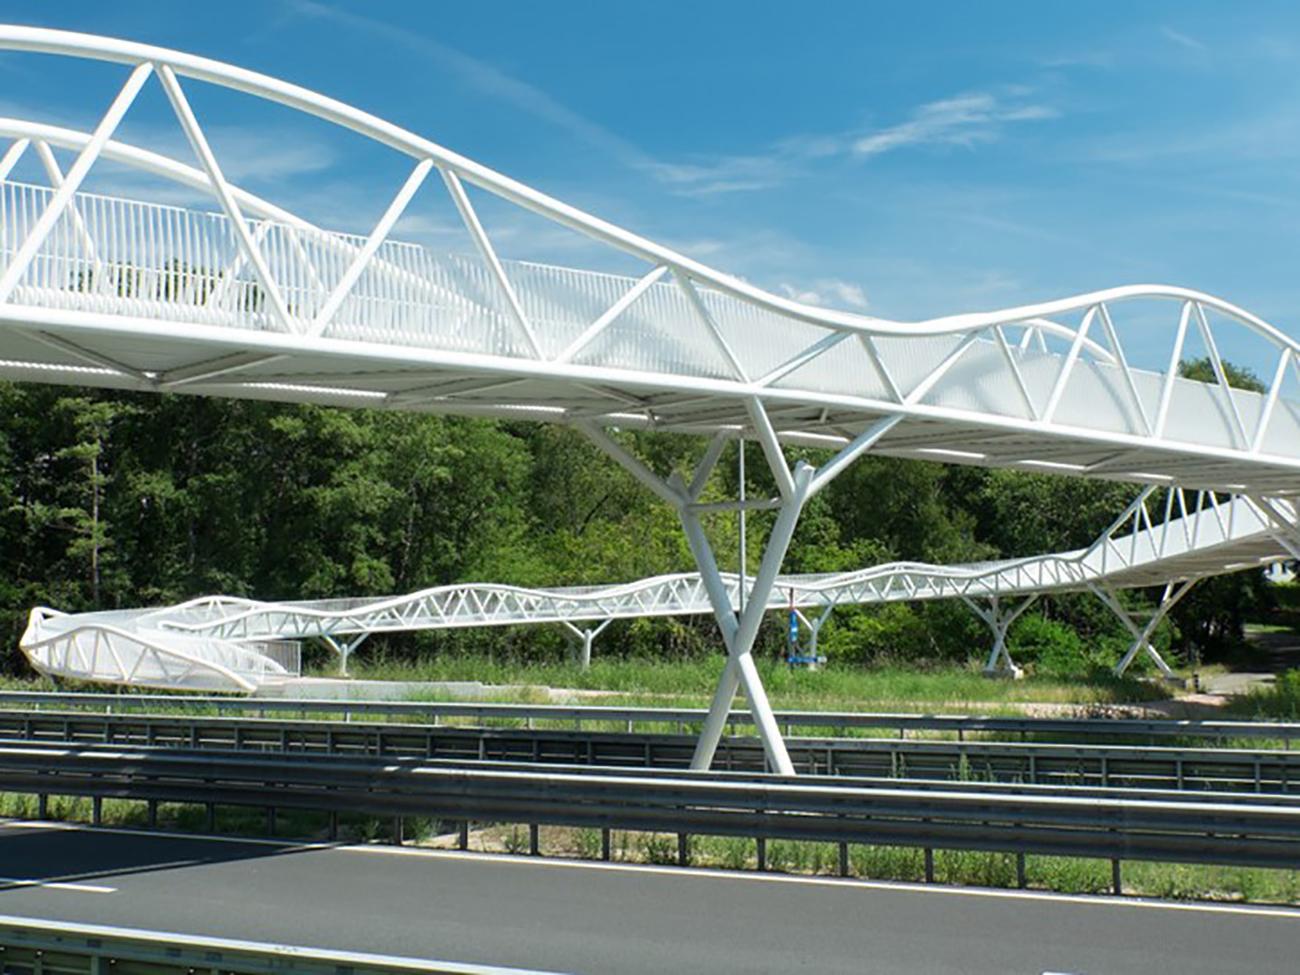 Fietsersbrug Genk01_1300x975